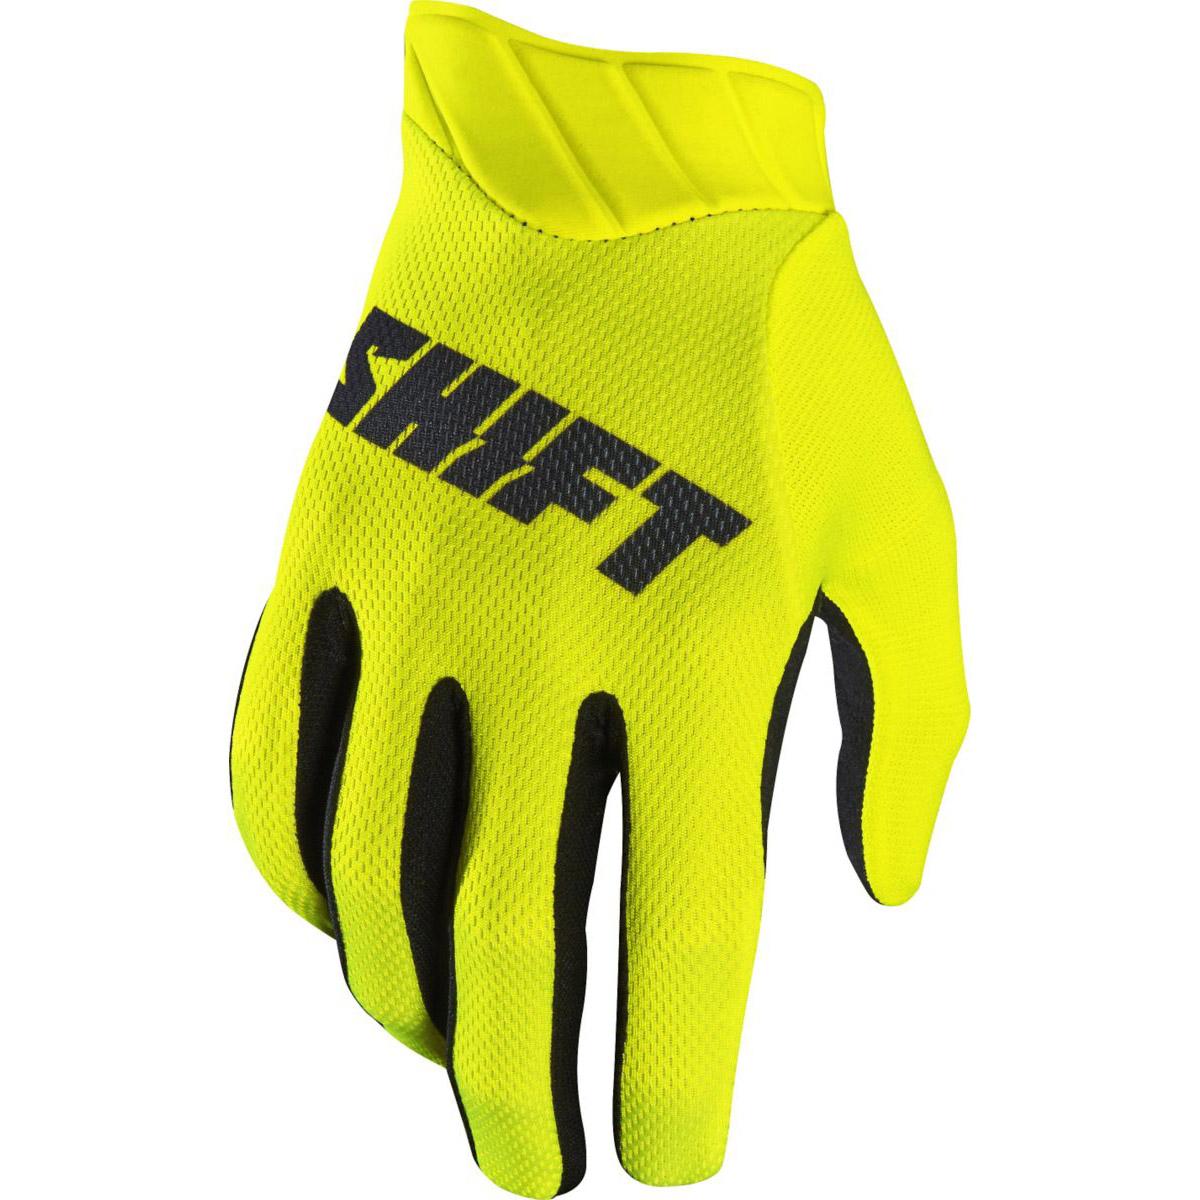 Shift - 2017 3LACK Label Air перчатки, желтые